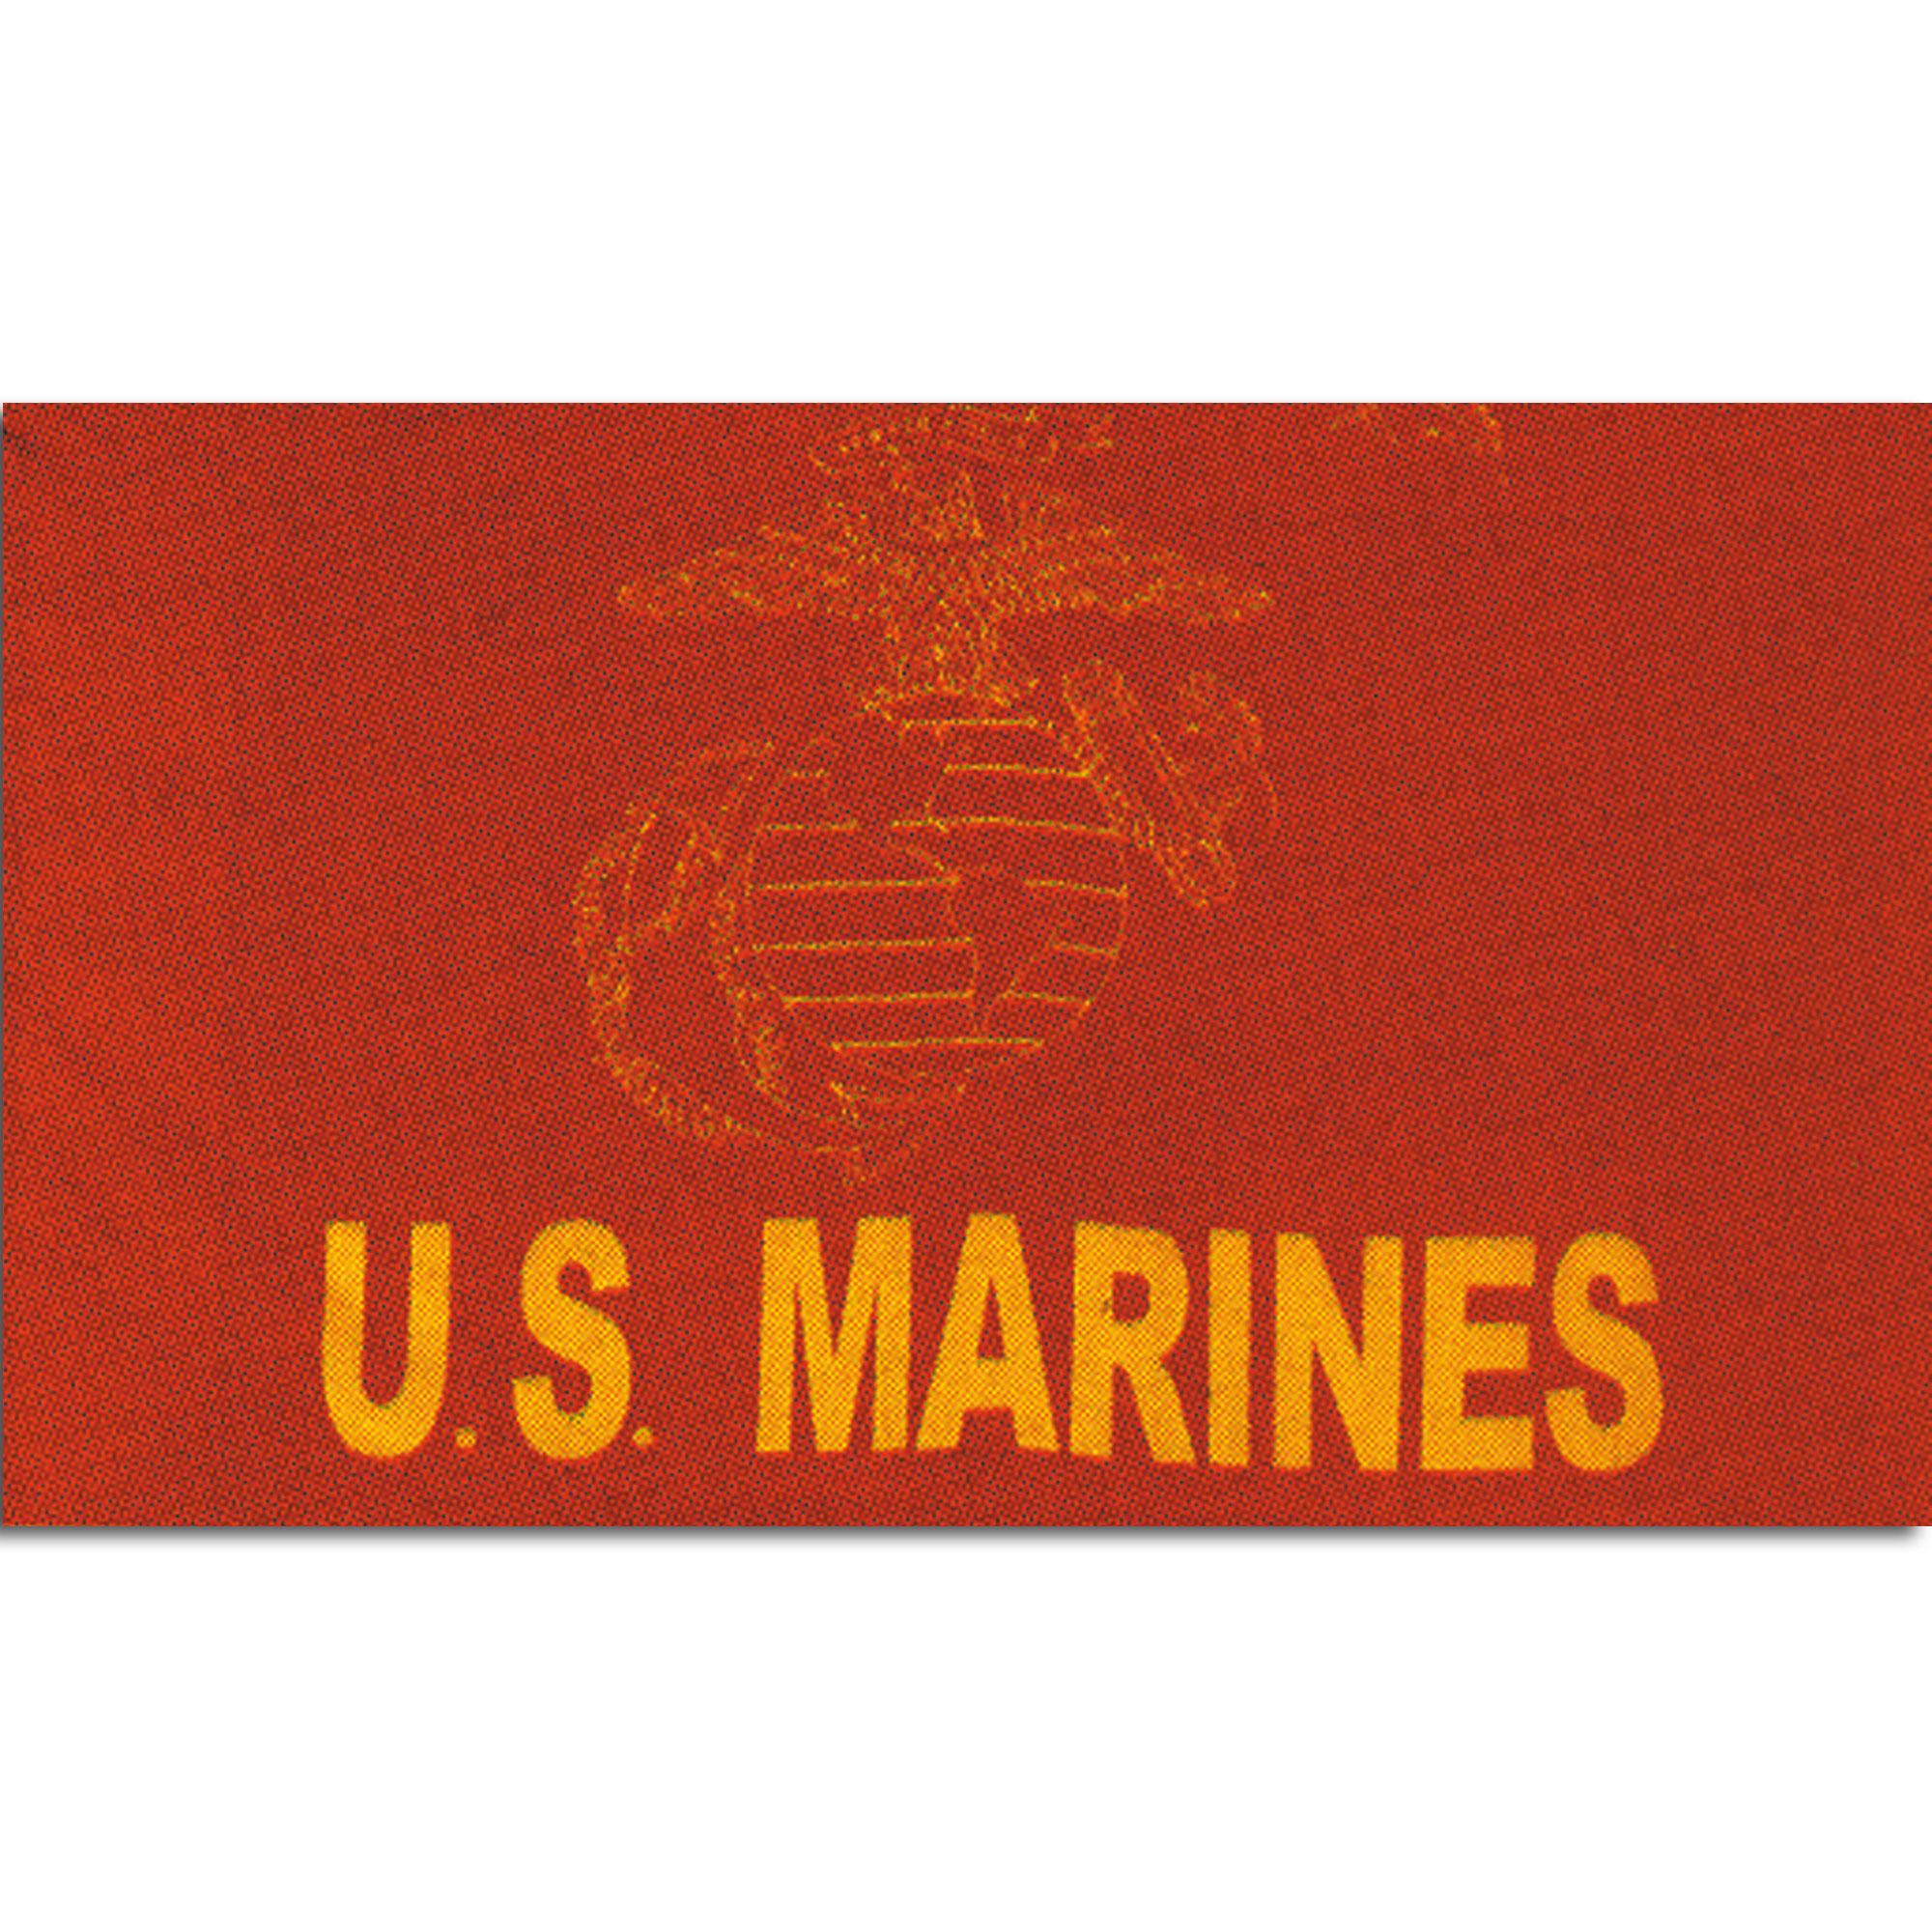 Bandera US Marines roja